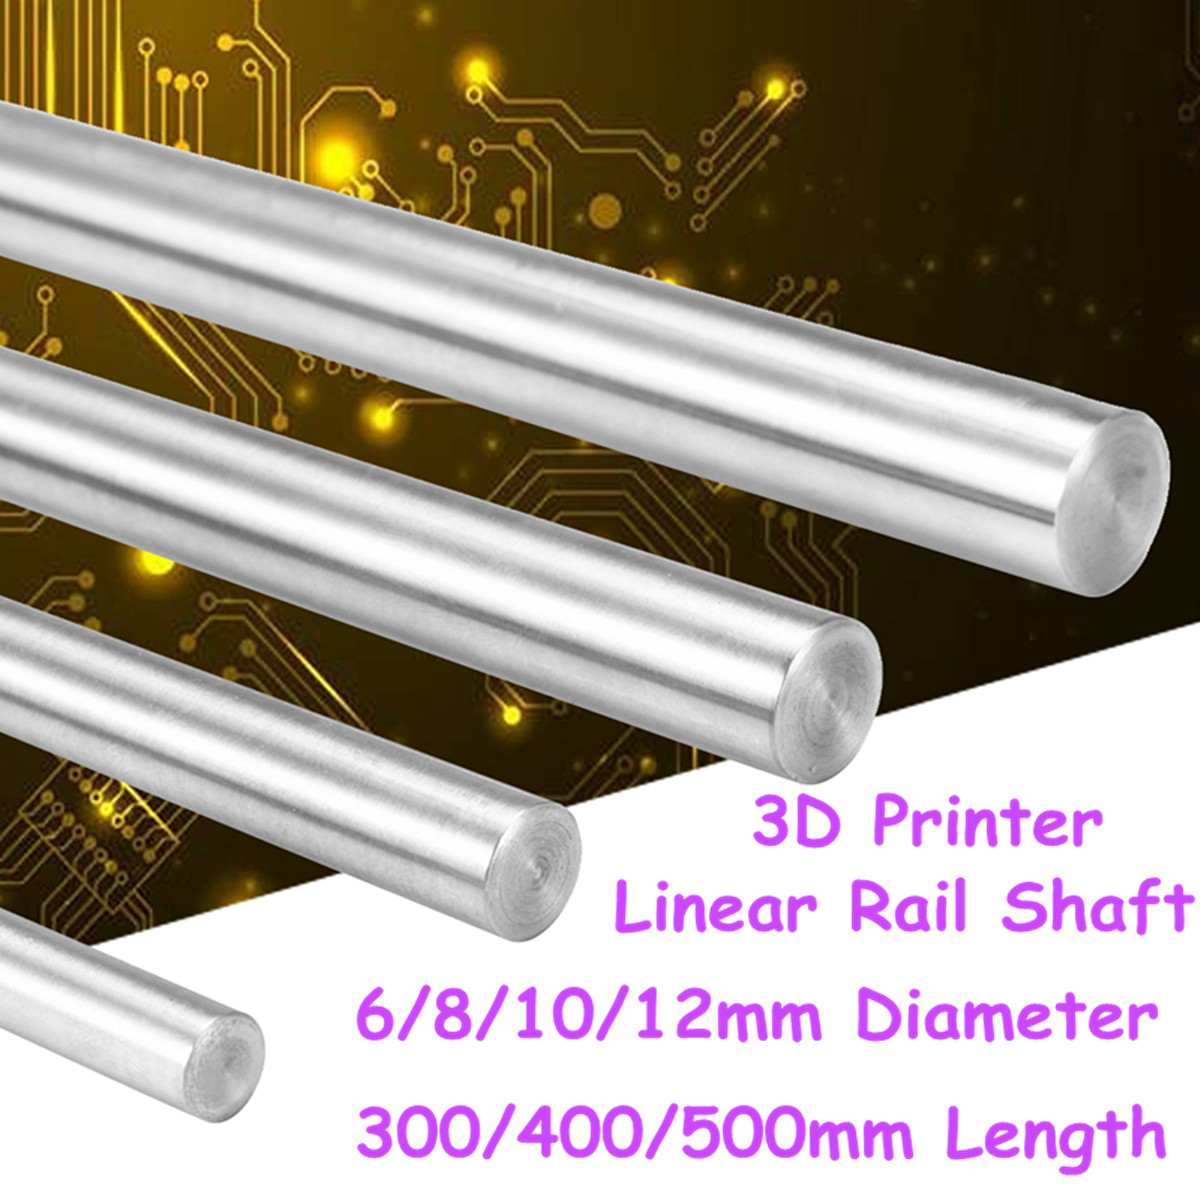 8mm CNC 3D Printer Axis Chromed Smooth Rod Steel Linear Rail Shaft 300//400//500mm